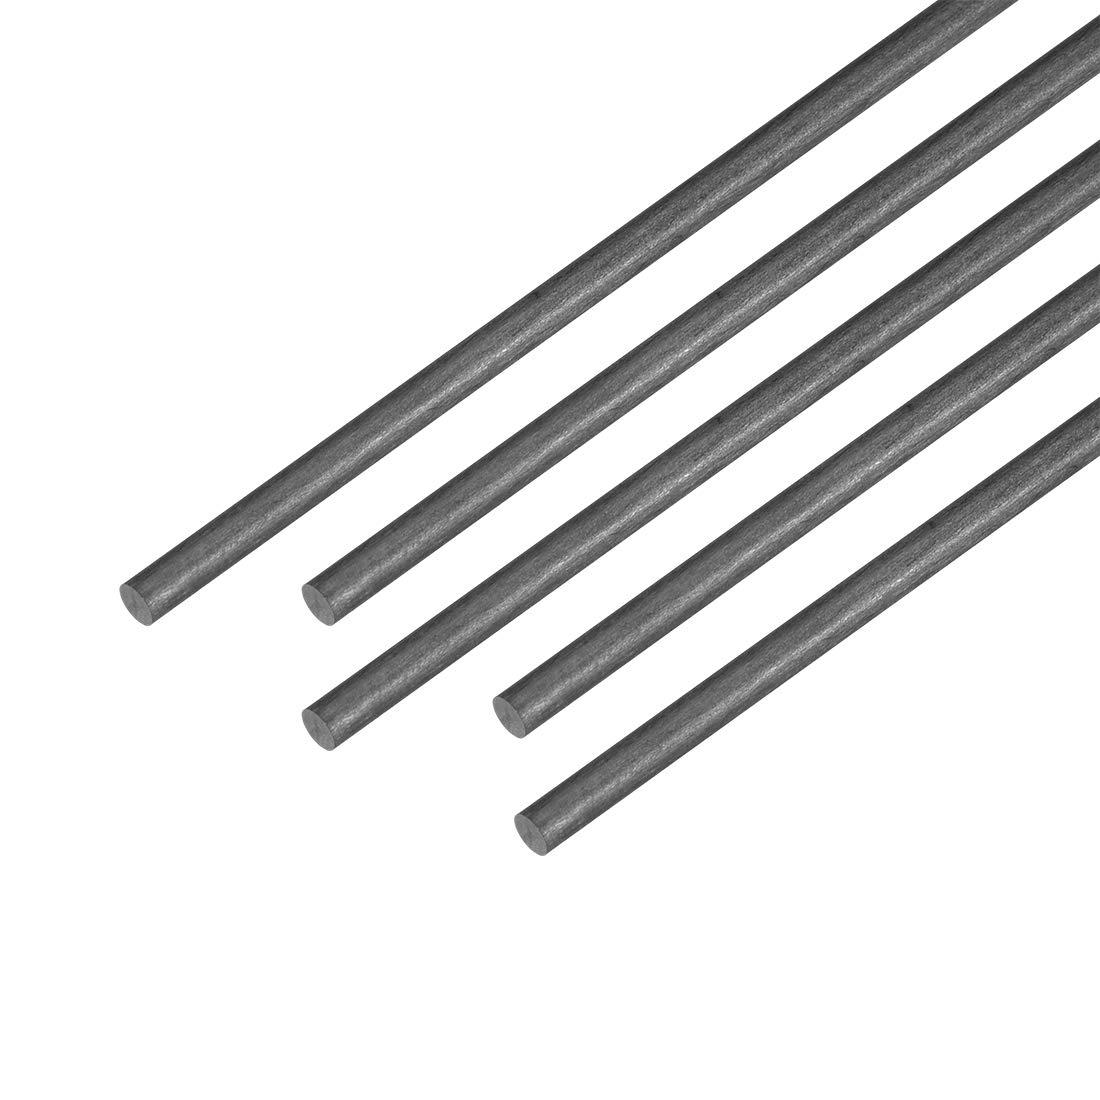 uxcell 2mm Carbon Fiber Bar for RC Airplane Matte Pole US 5pcs 400mm 15.7 inch